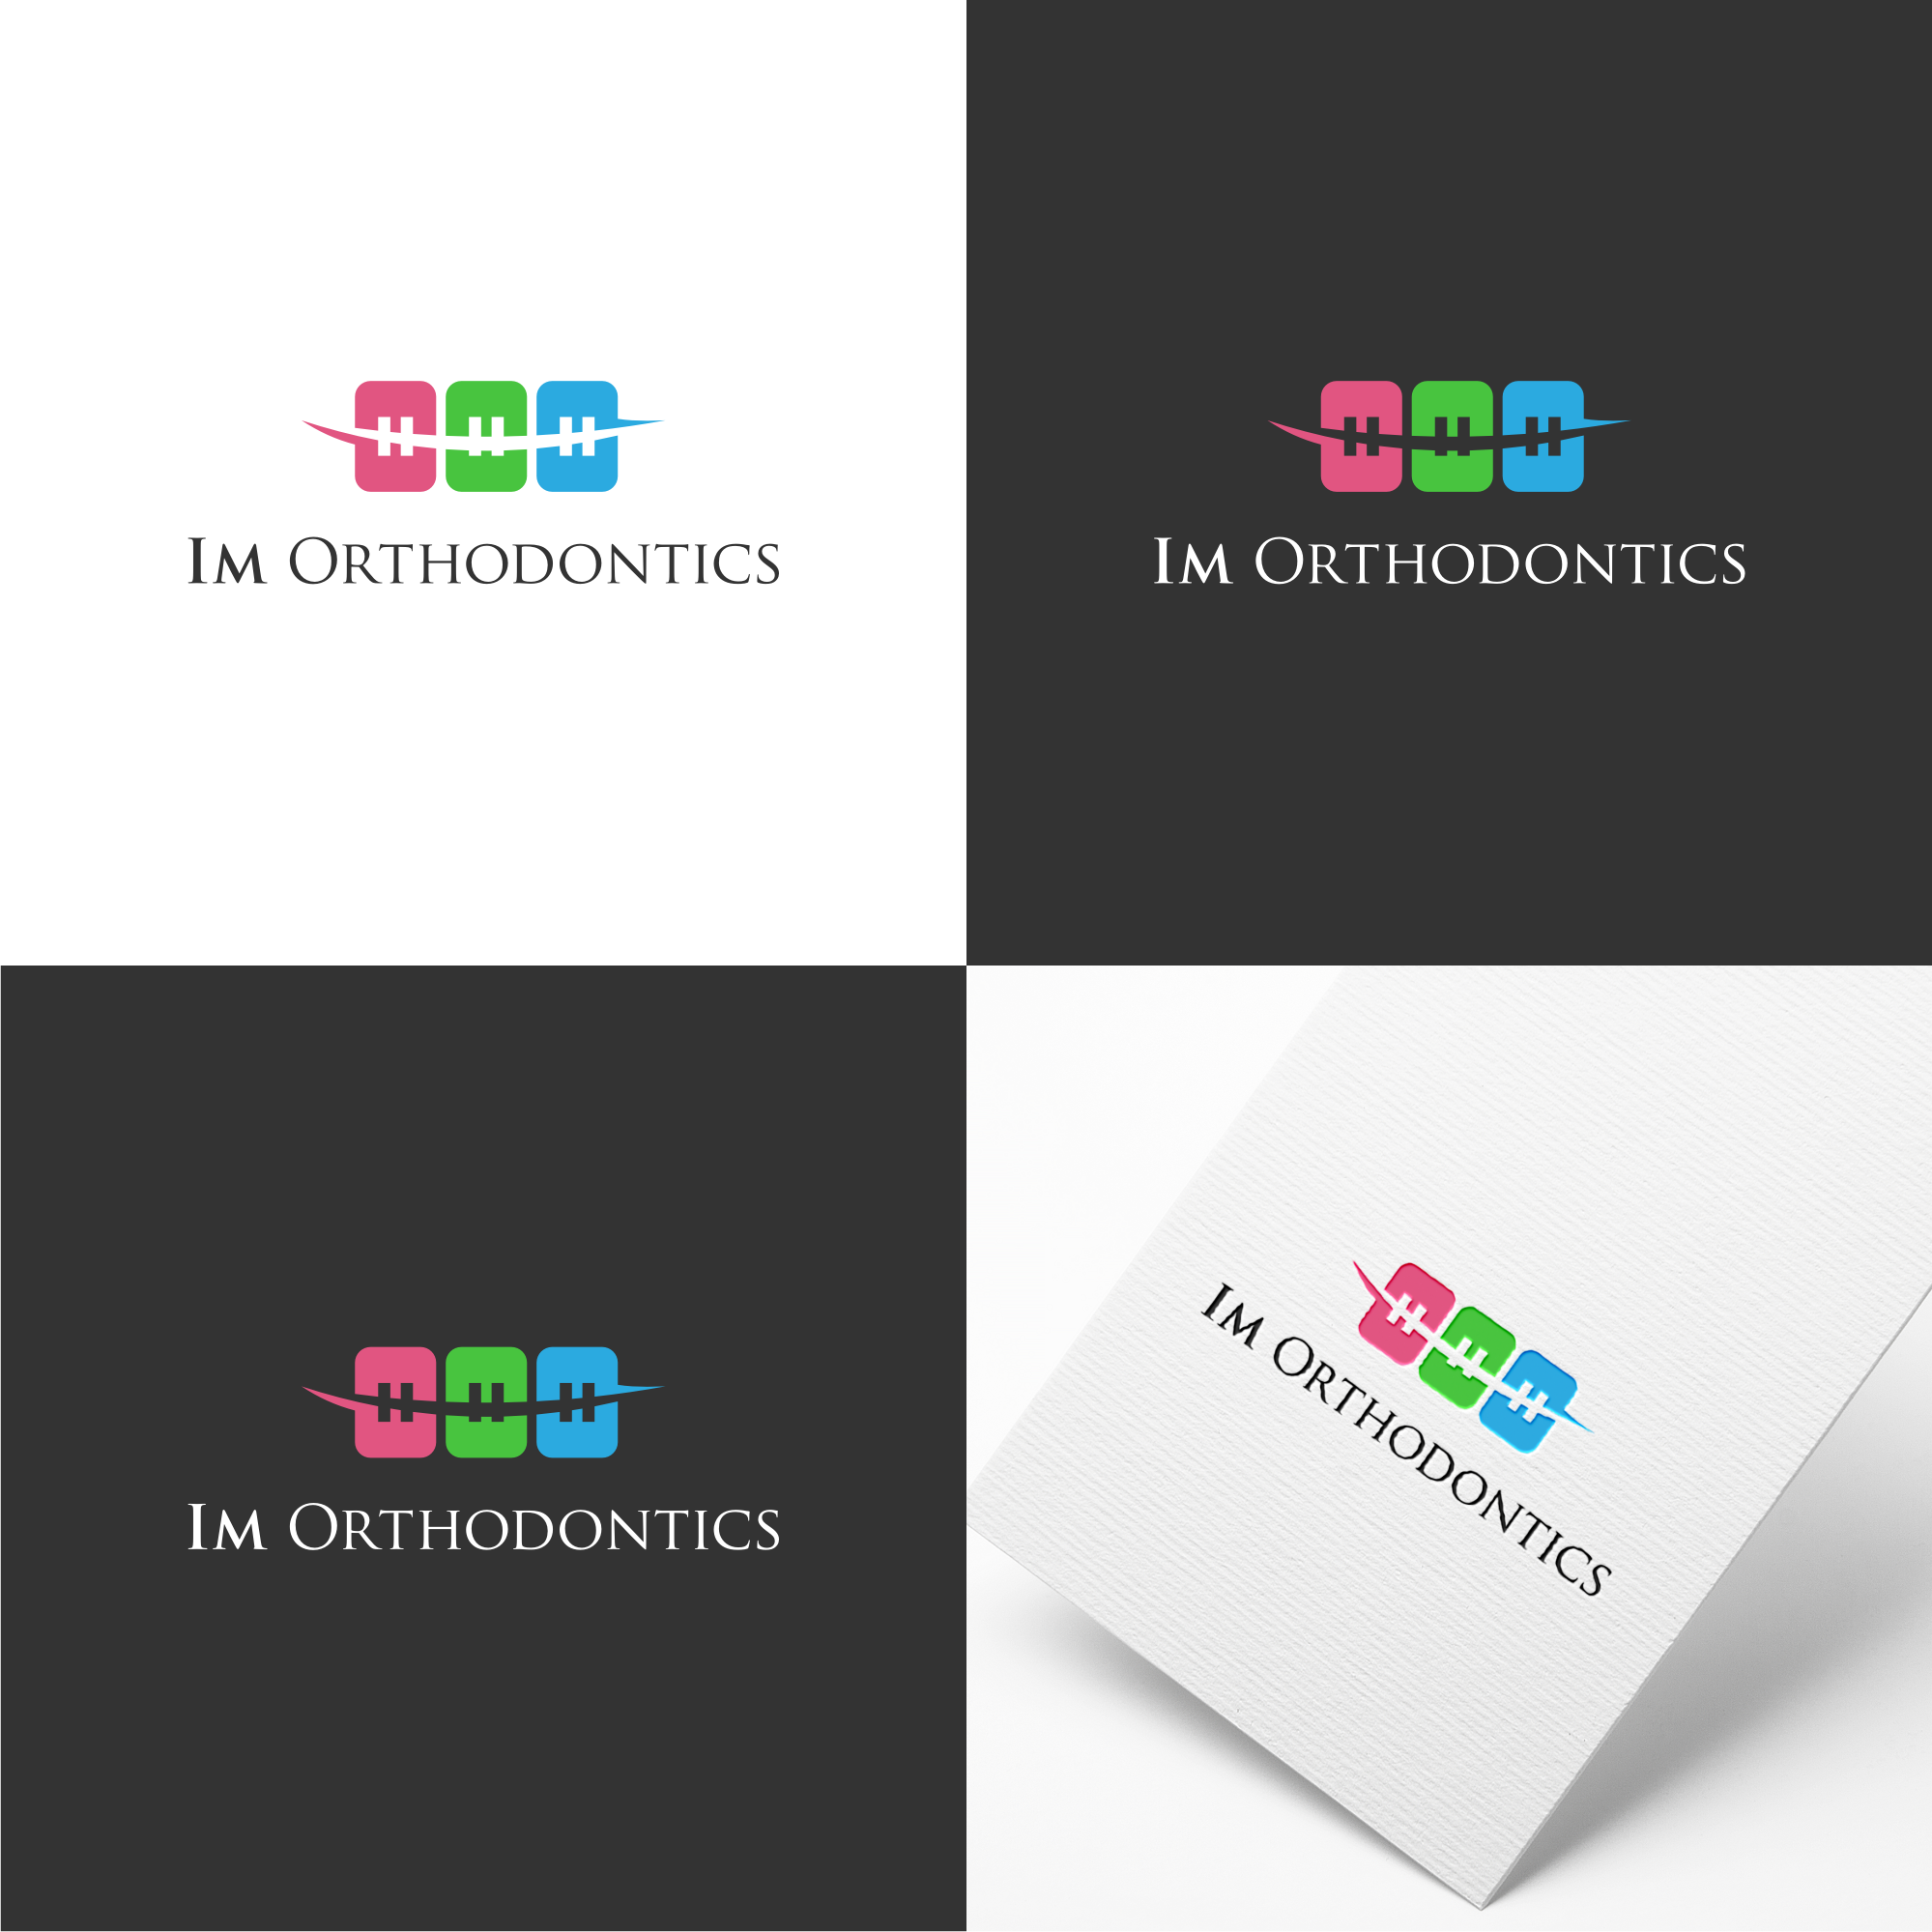 Orthodontics Logo Design Required By Im Orthodontics Ad Logo Sponsored Orthodontics Design Im Dental Logo Logo Design Logo Design Contest